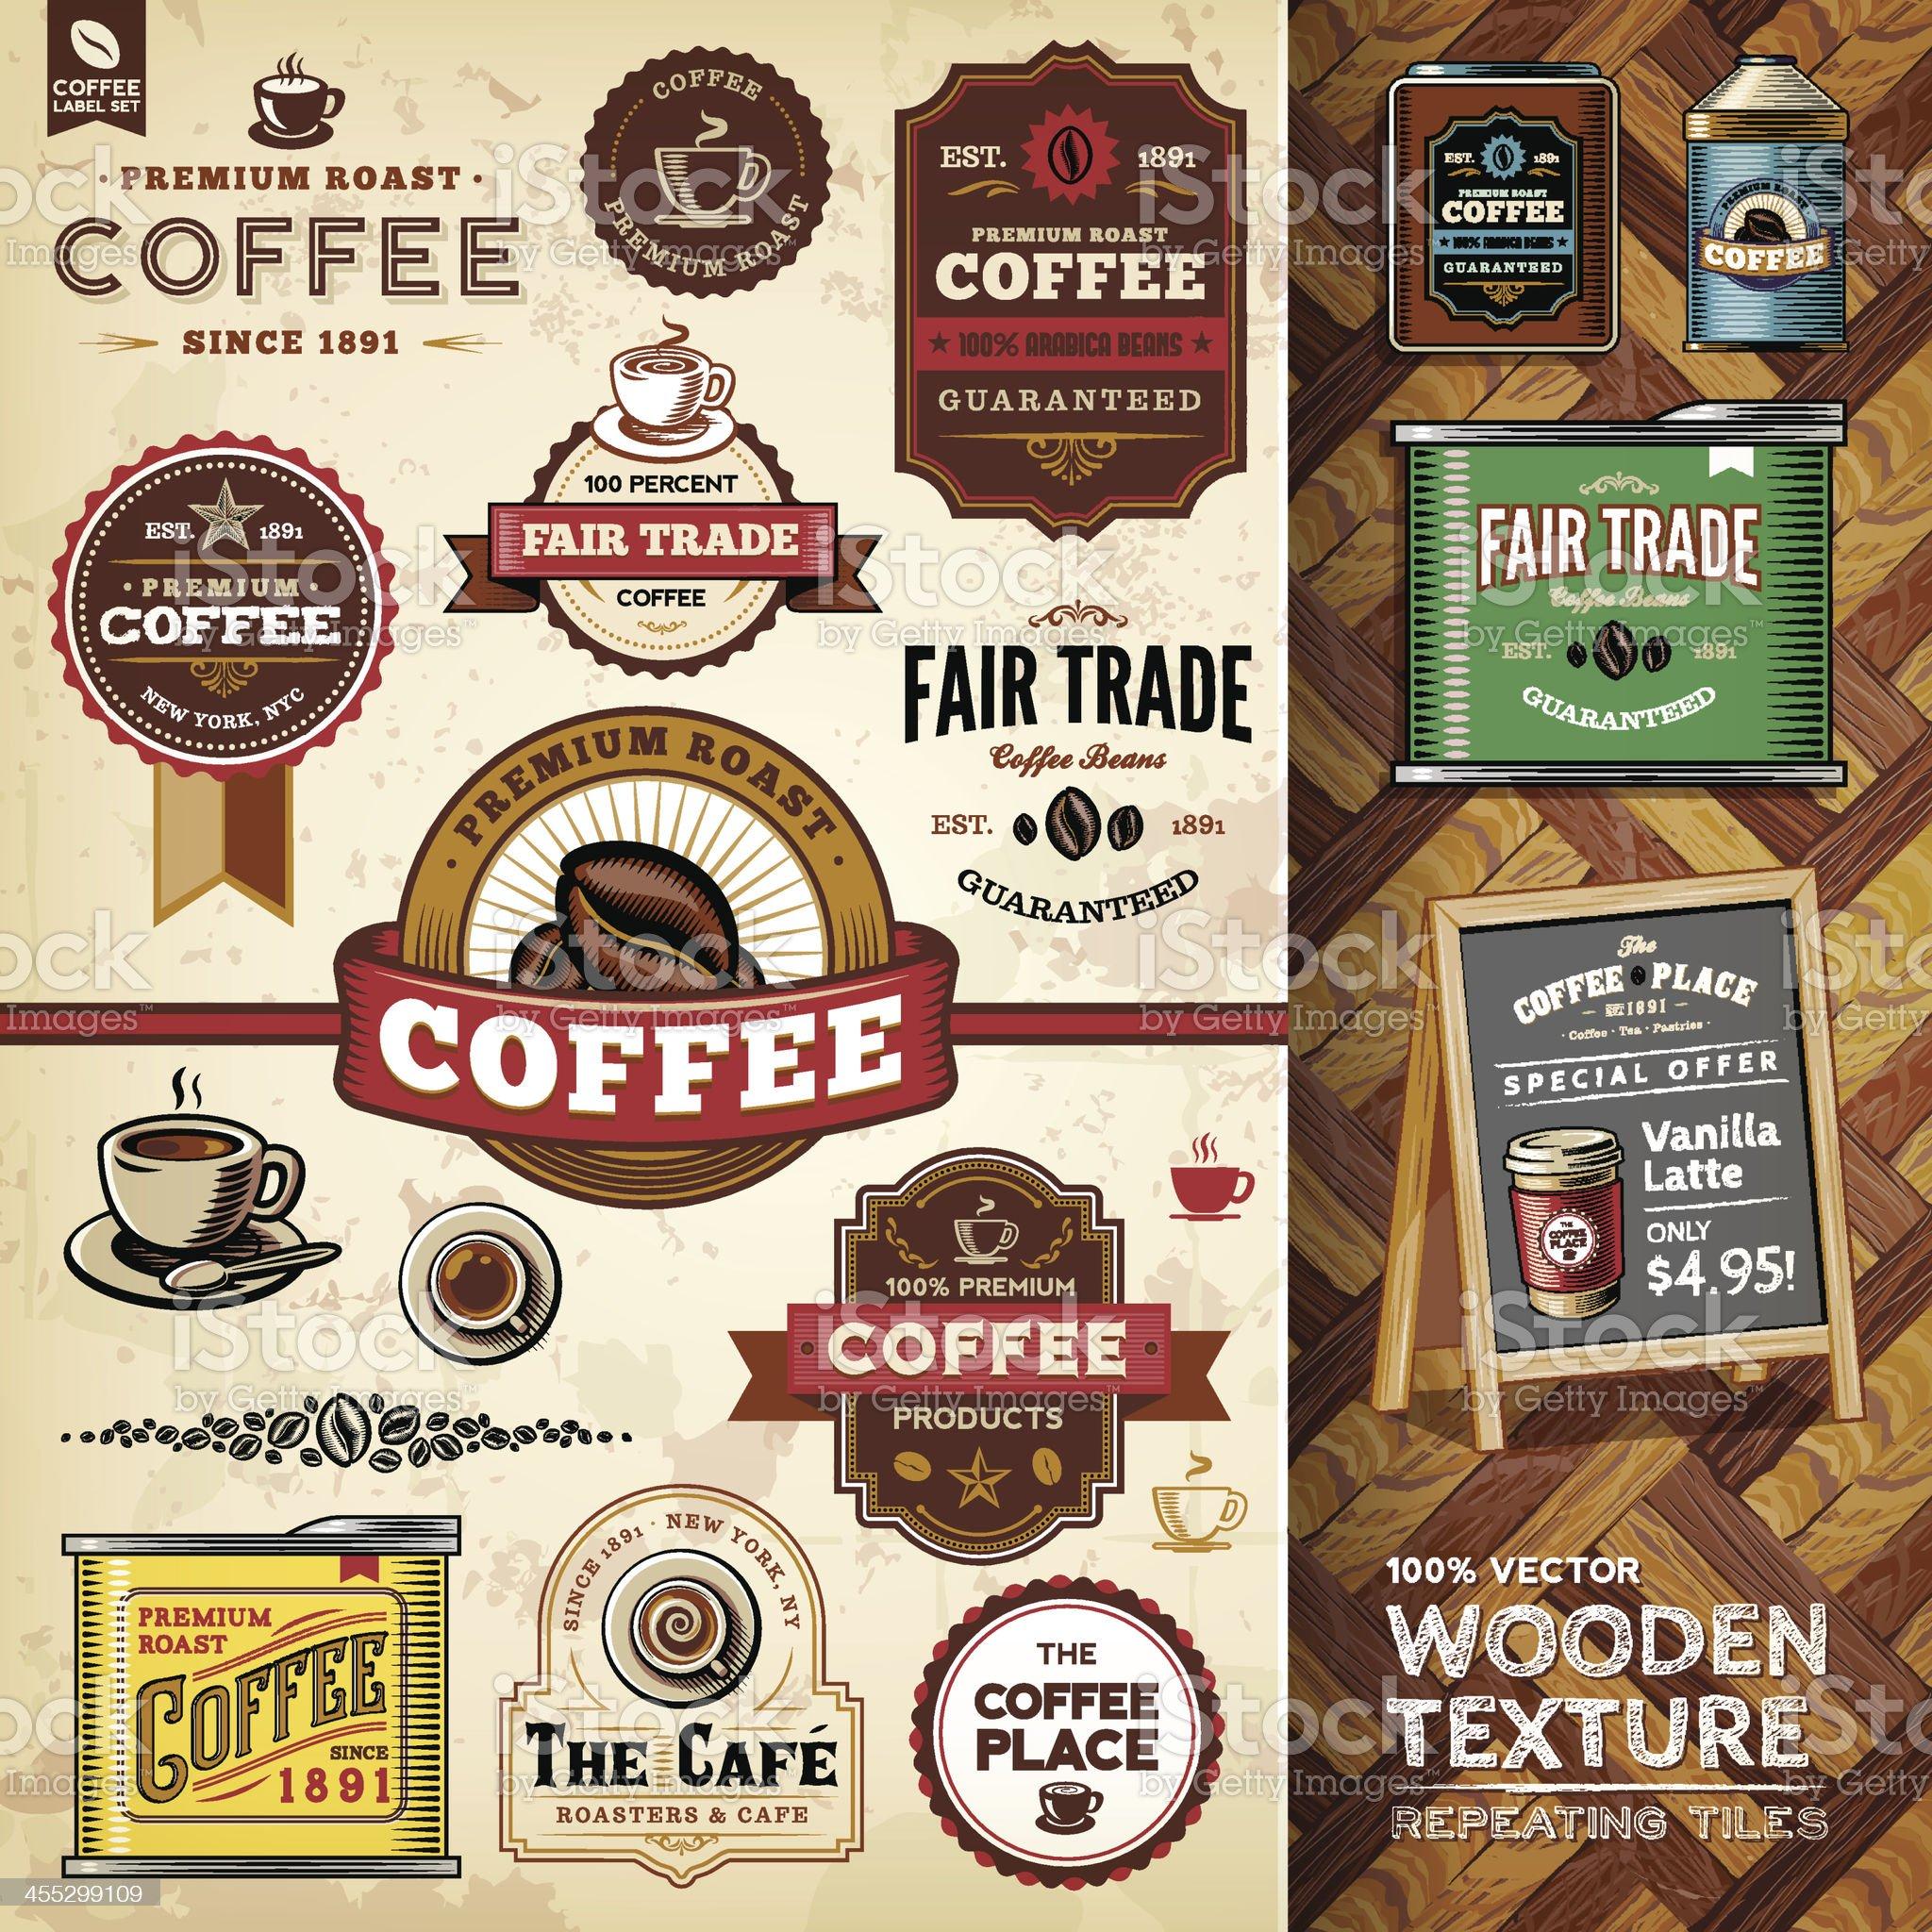 Coffee Design Elements royalty-free stock vector art